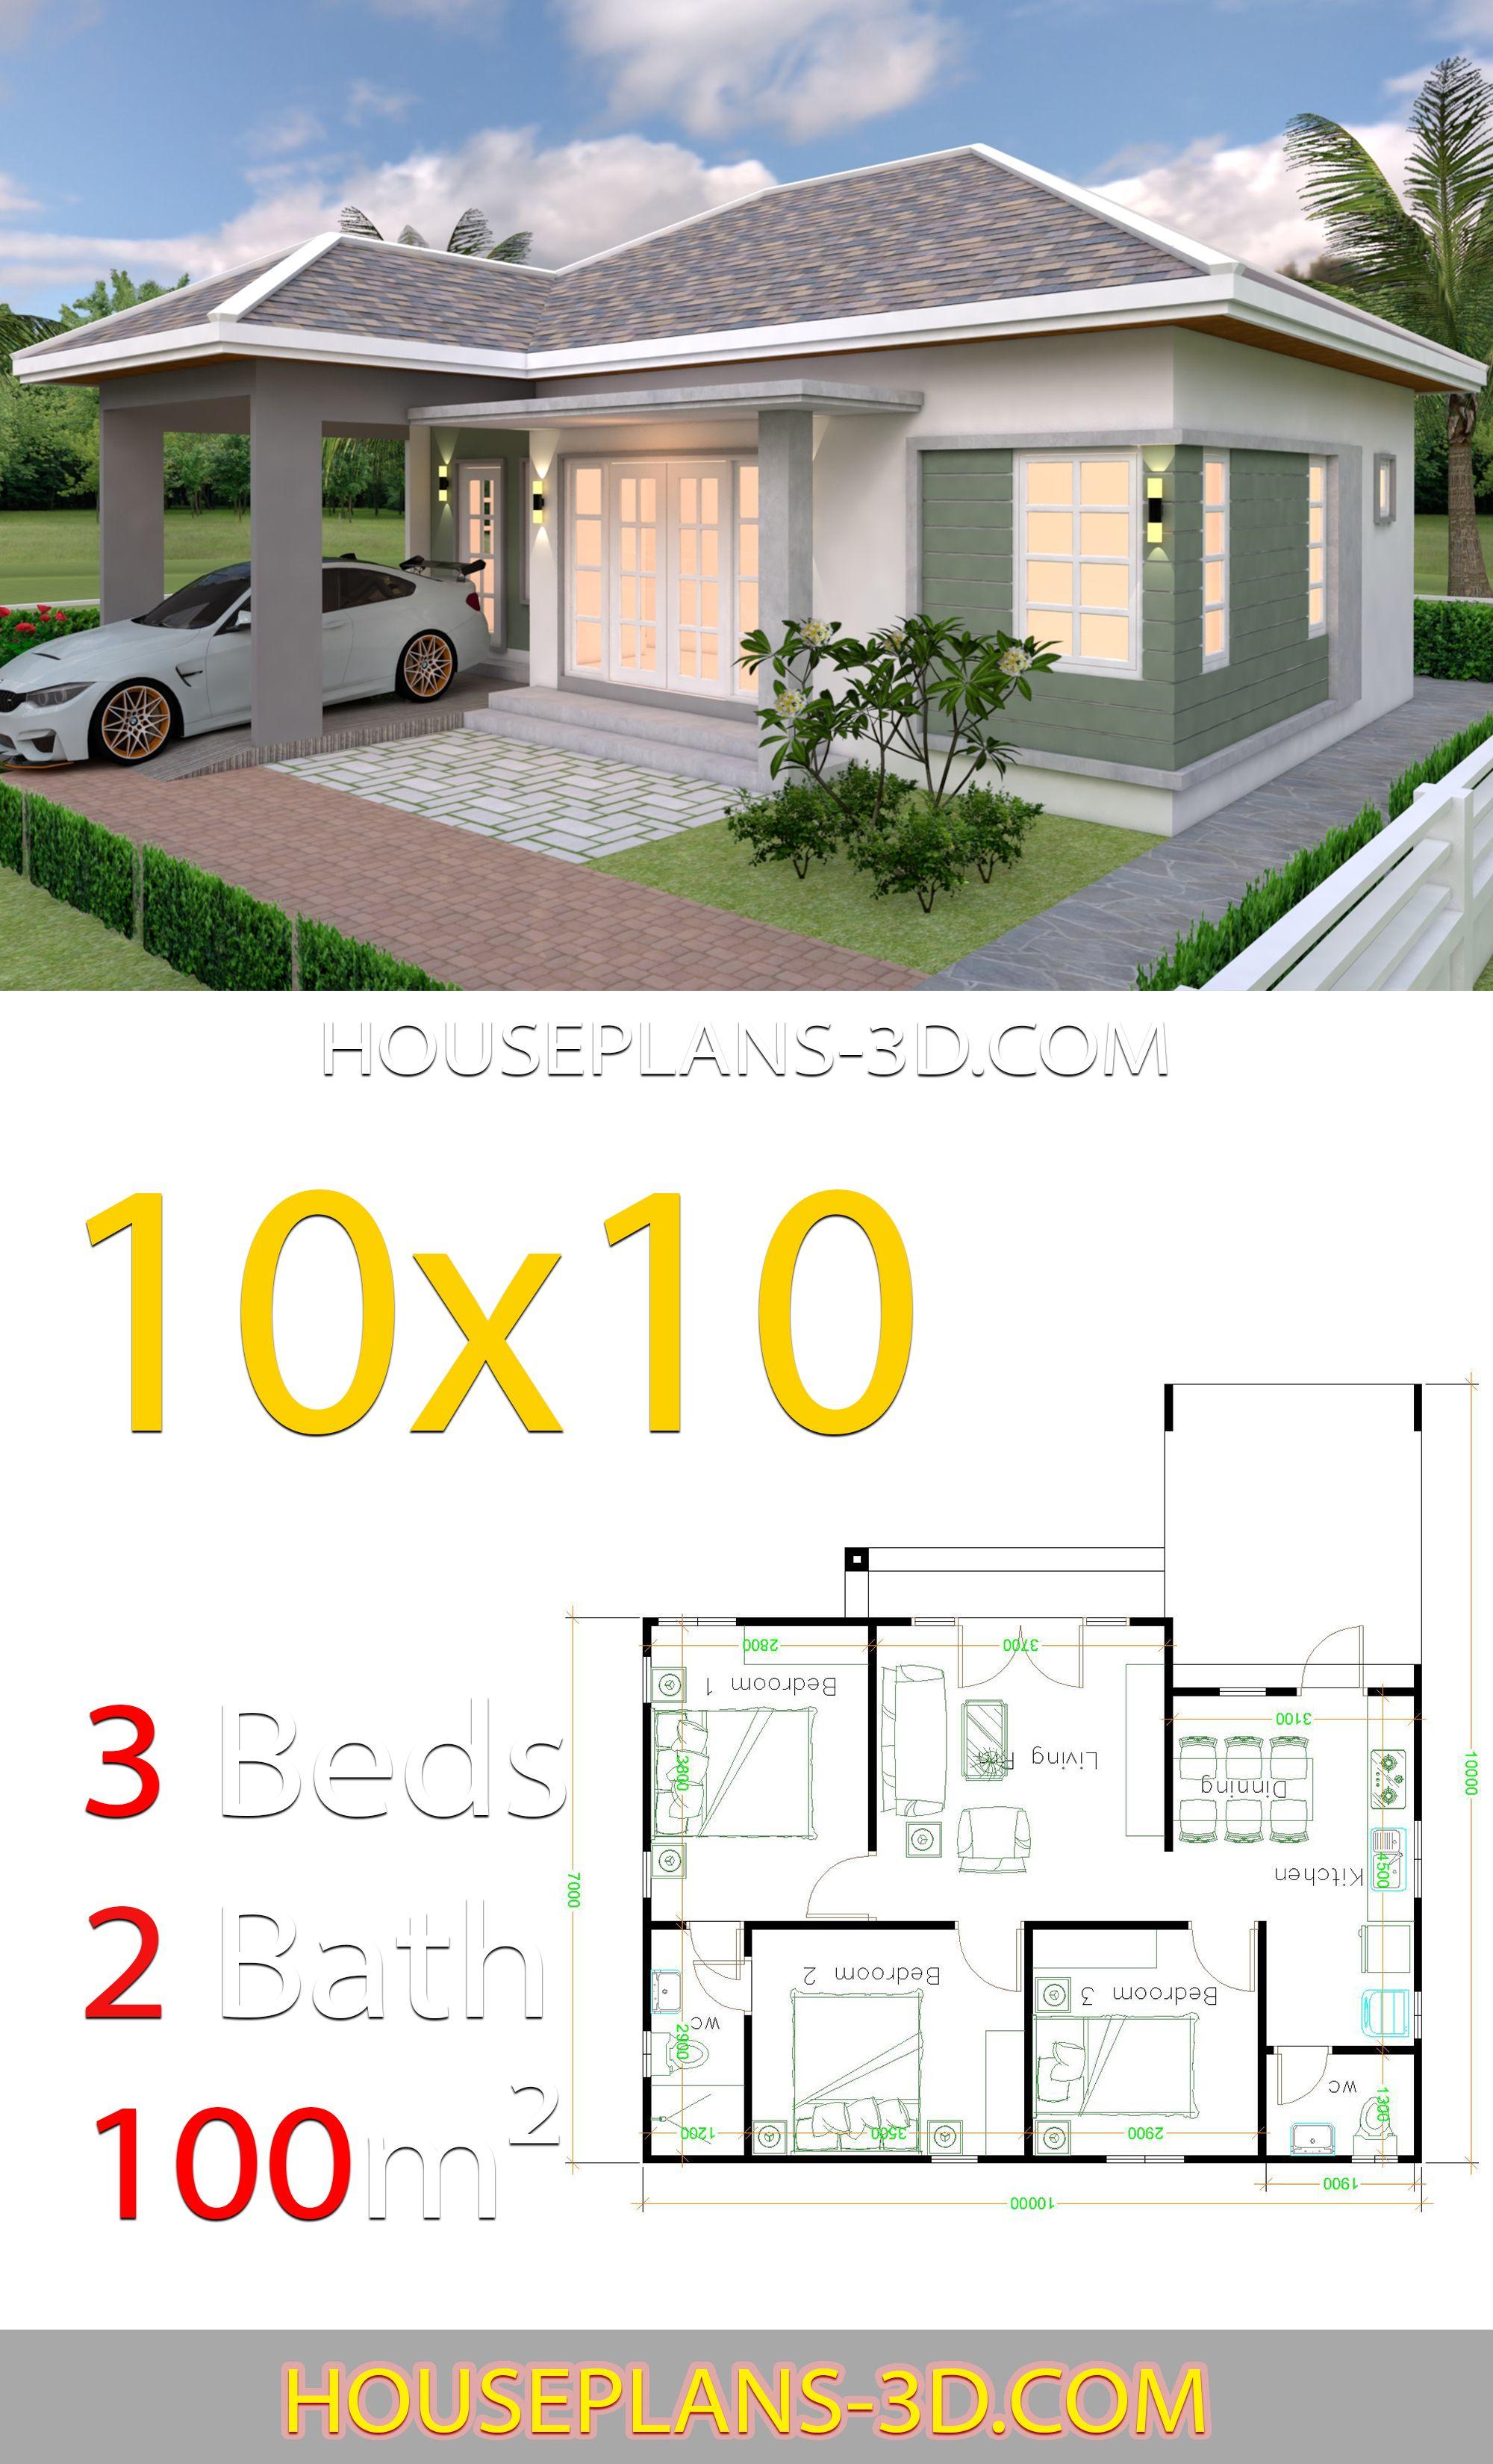 10X10 ház alaprajz